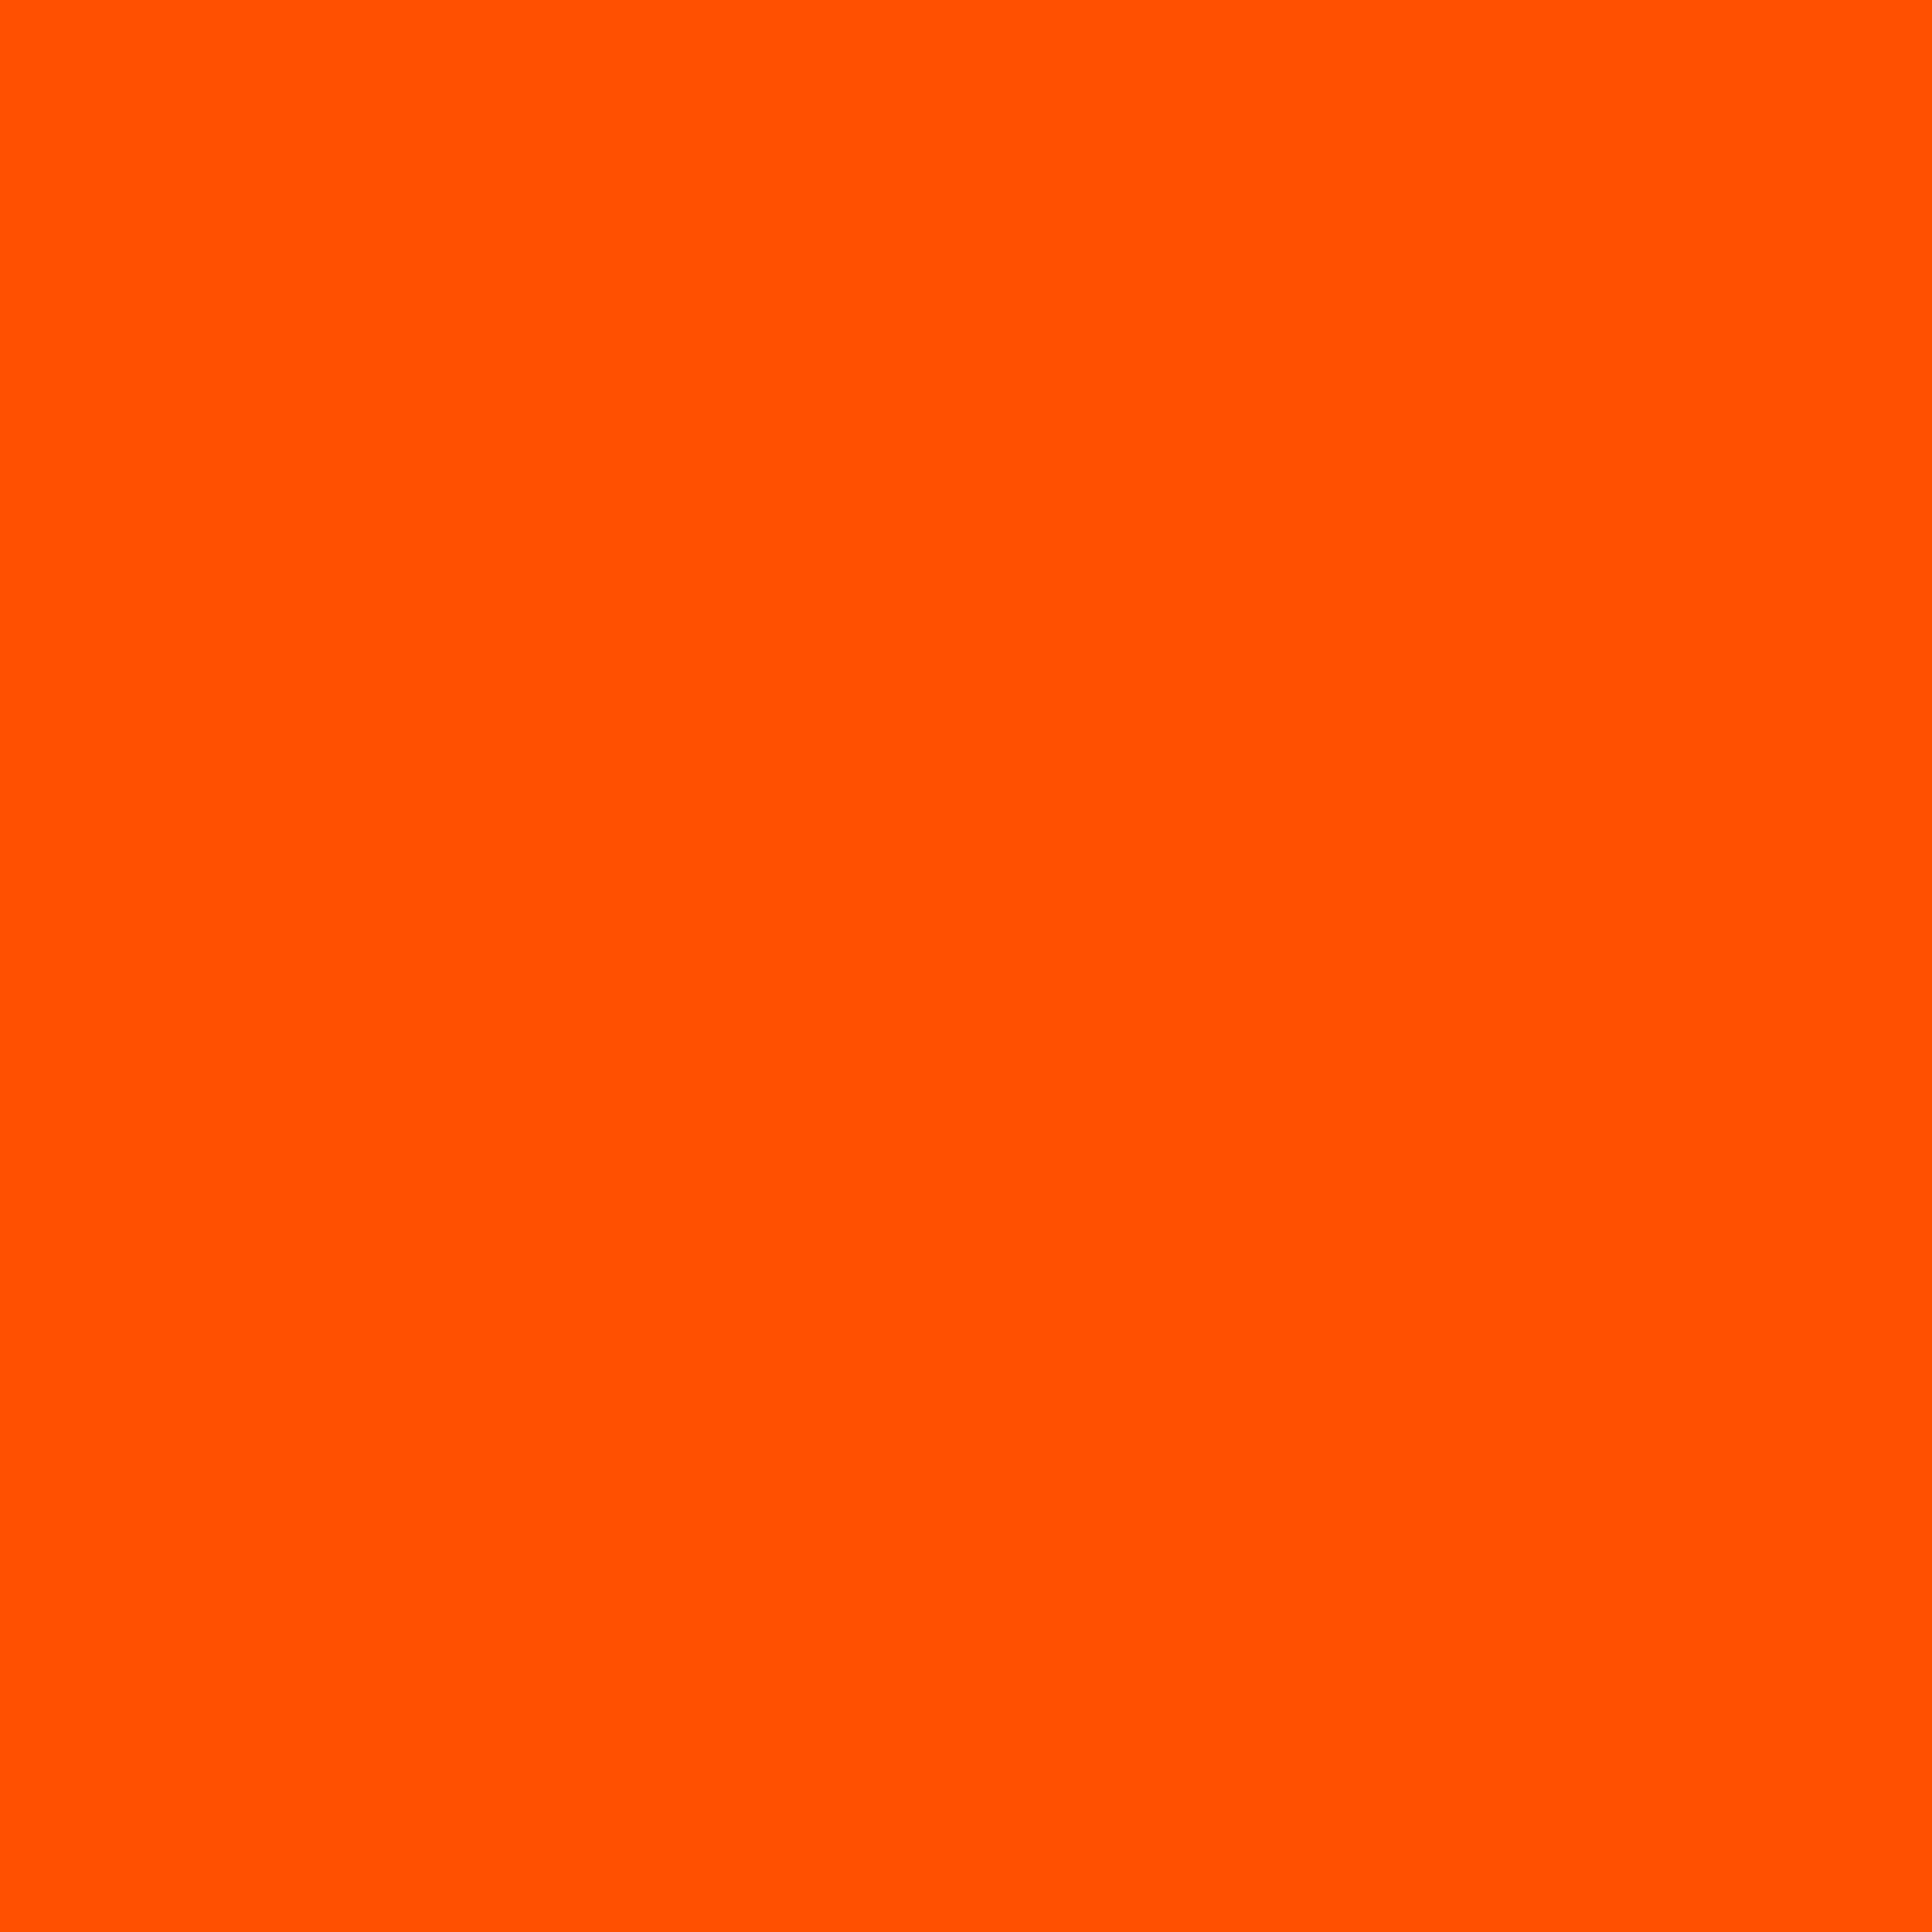 2048x2048 International Orange Aerospace Solid Color Background